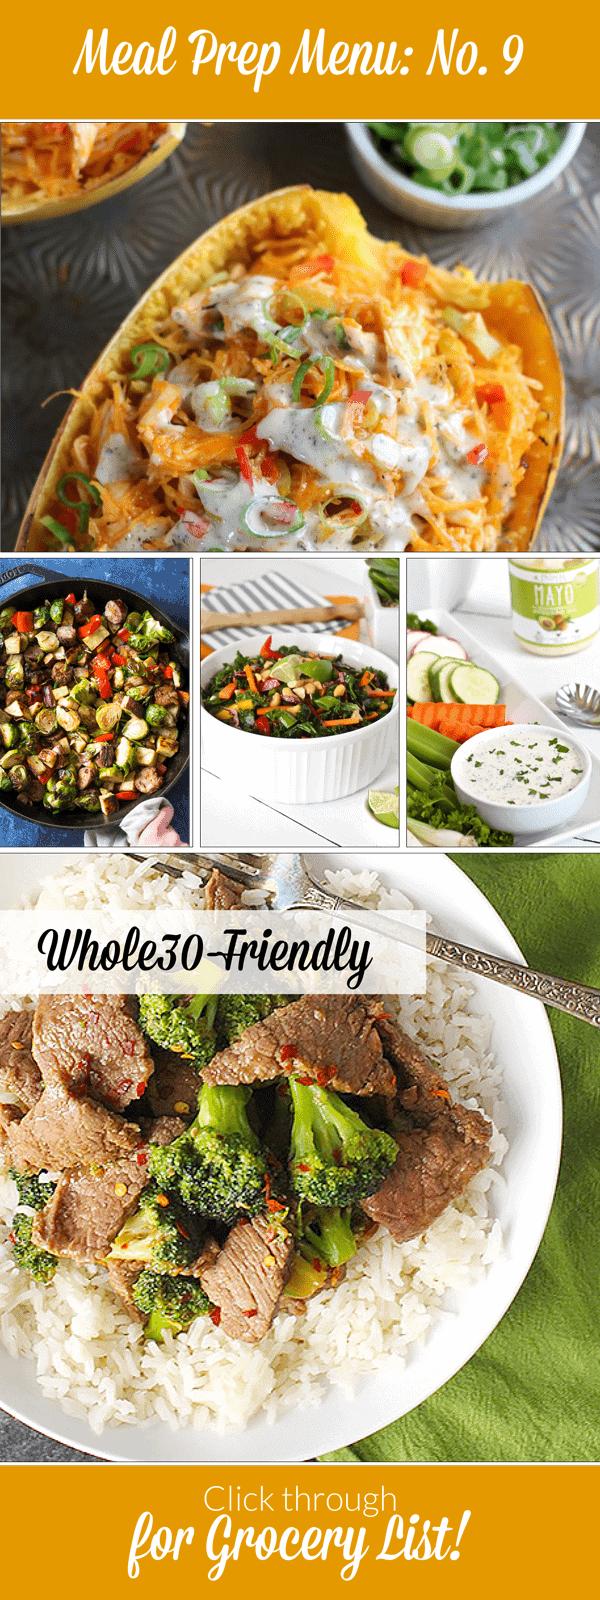 Weekly Meal Prep Menu: No. 9 | The Real Food Dietitians | http://therealfoodrds.com/weekly-meal-prep-menu-no-9/